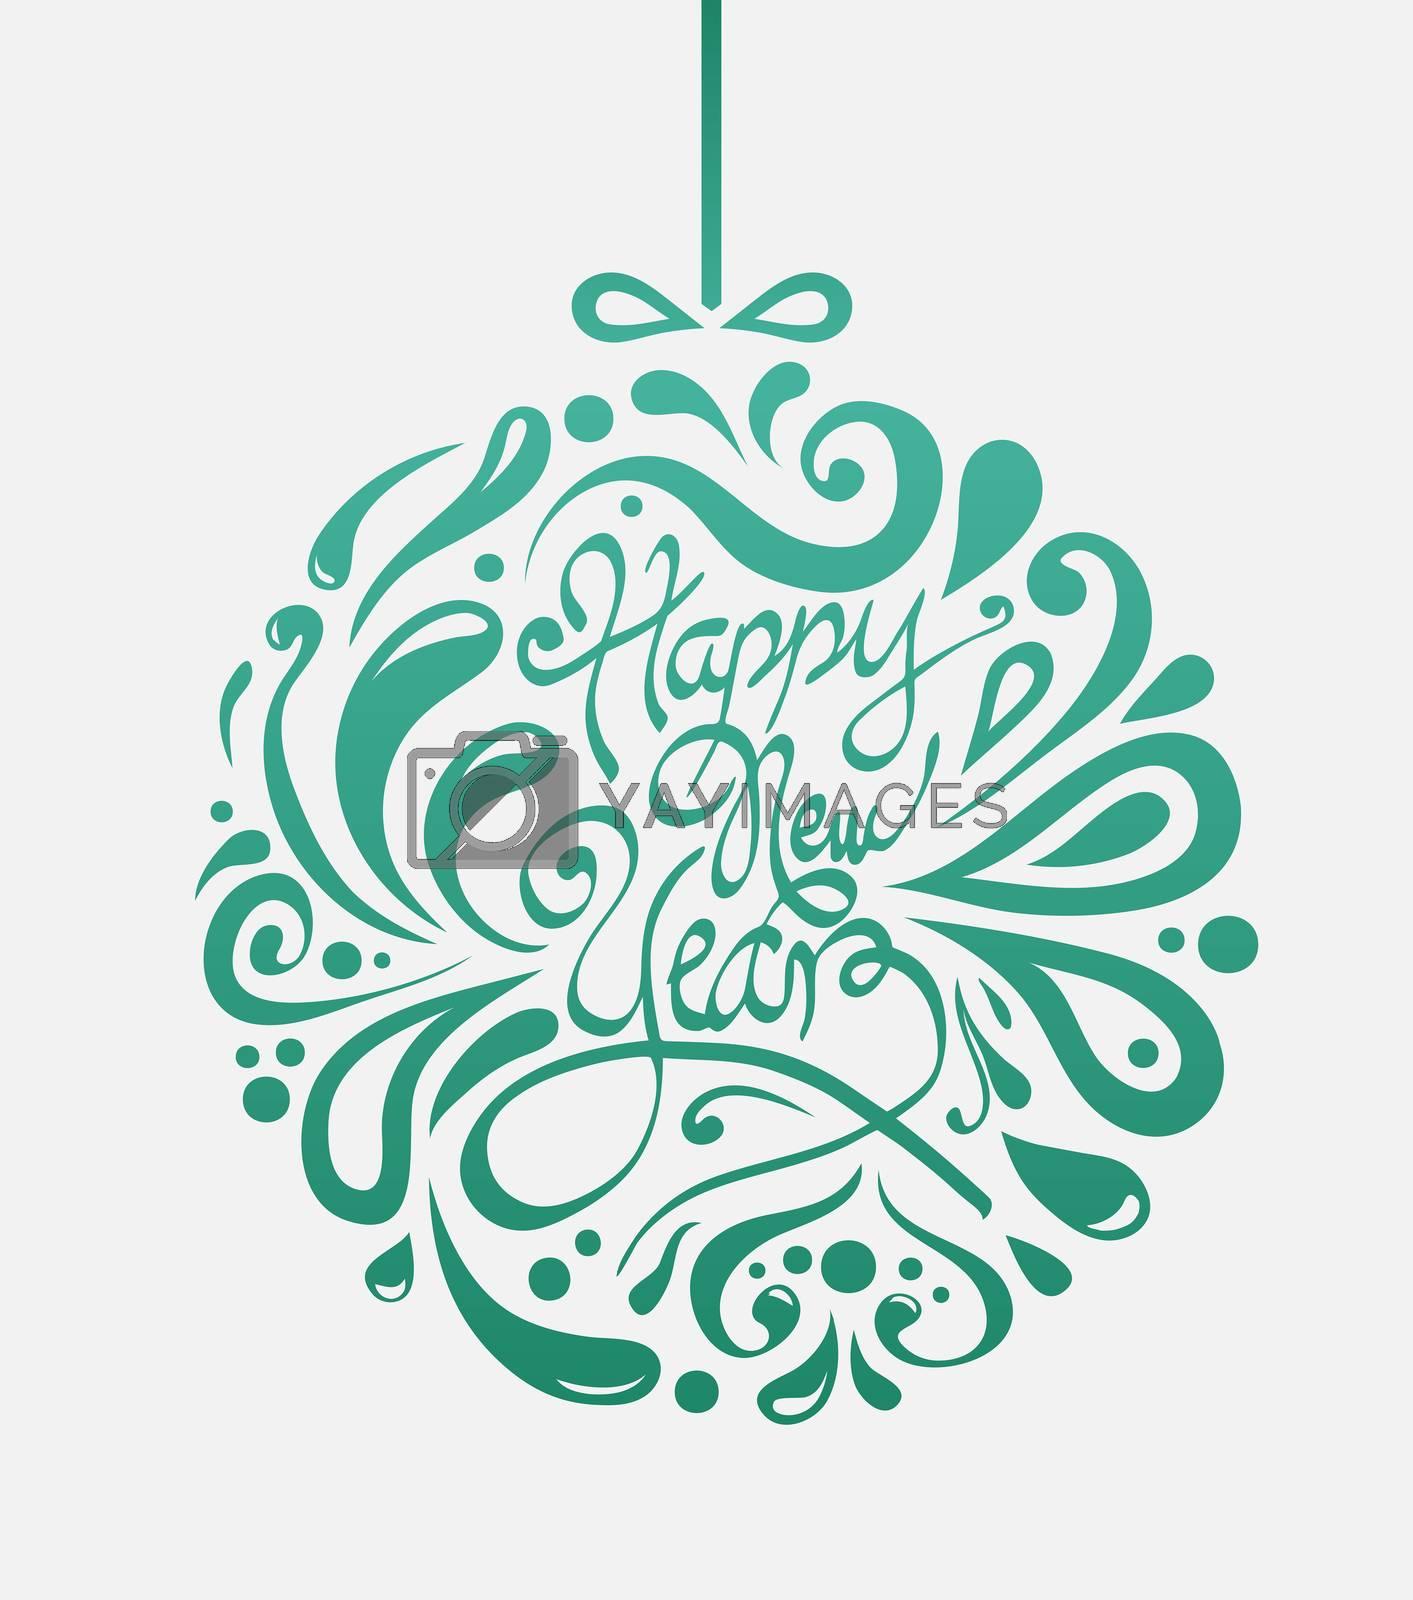 Digitally generated Stylish happy new year design in green